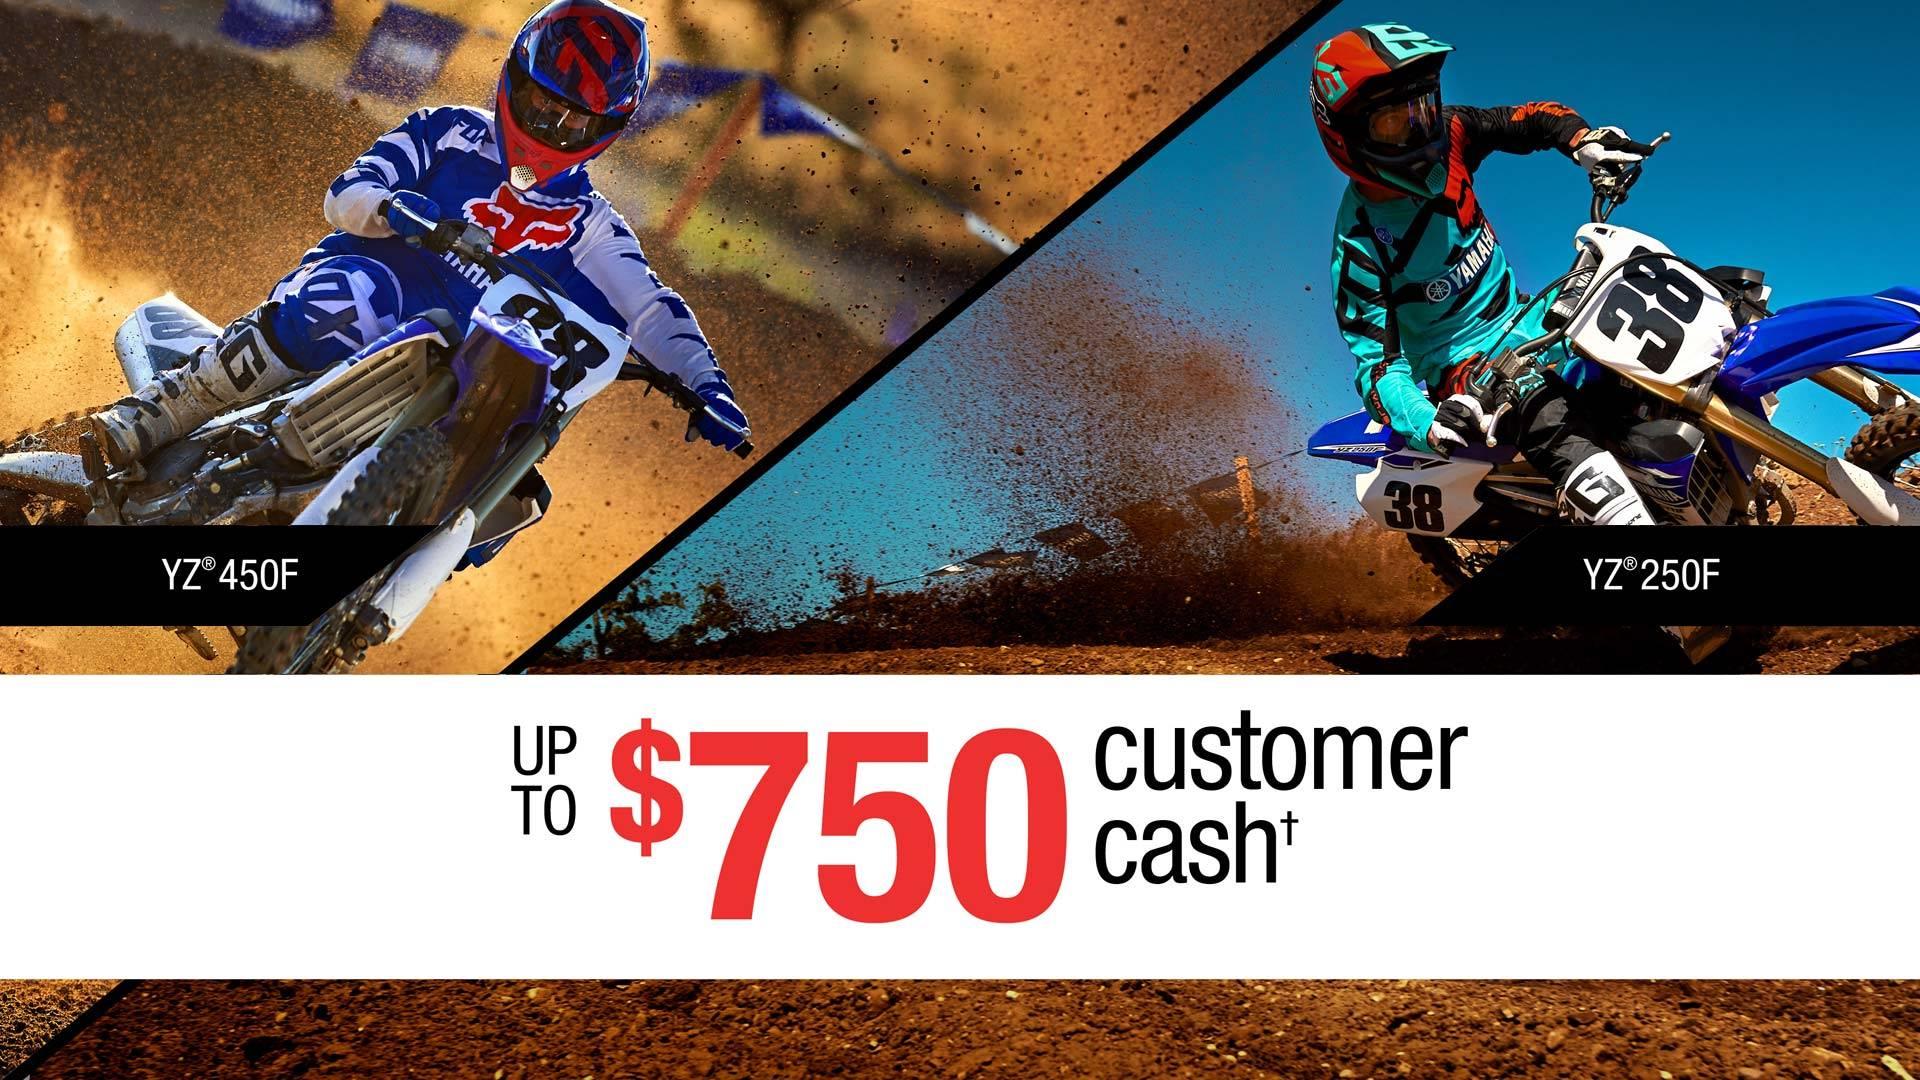 Yamaha - Dirt Motorcycles